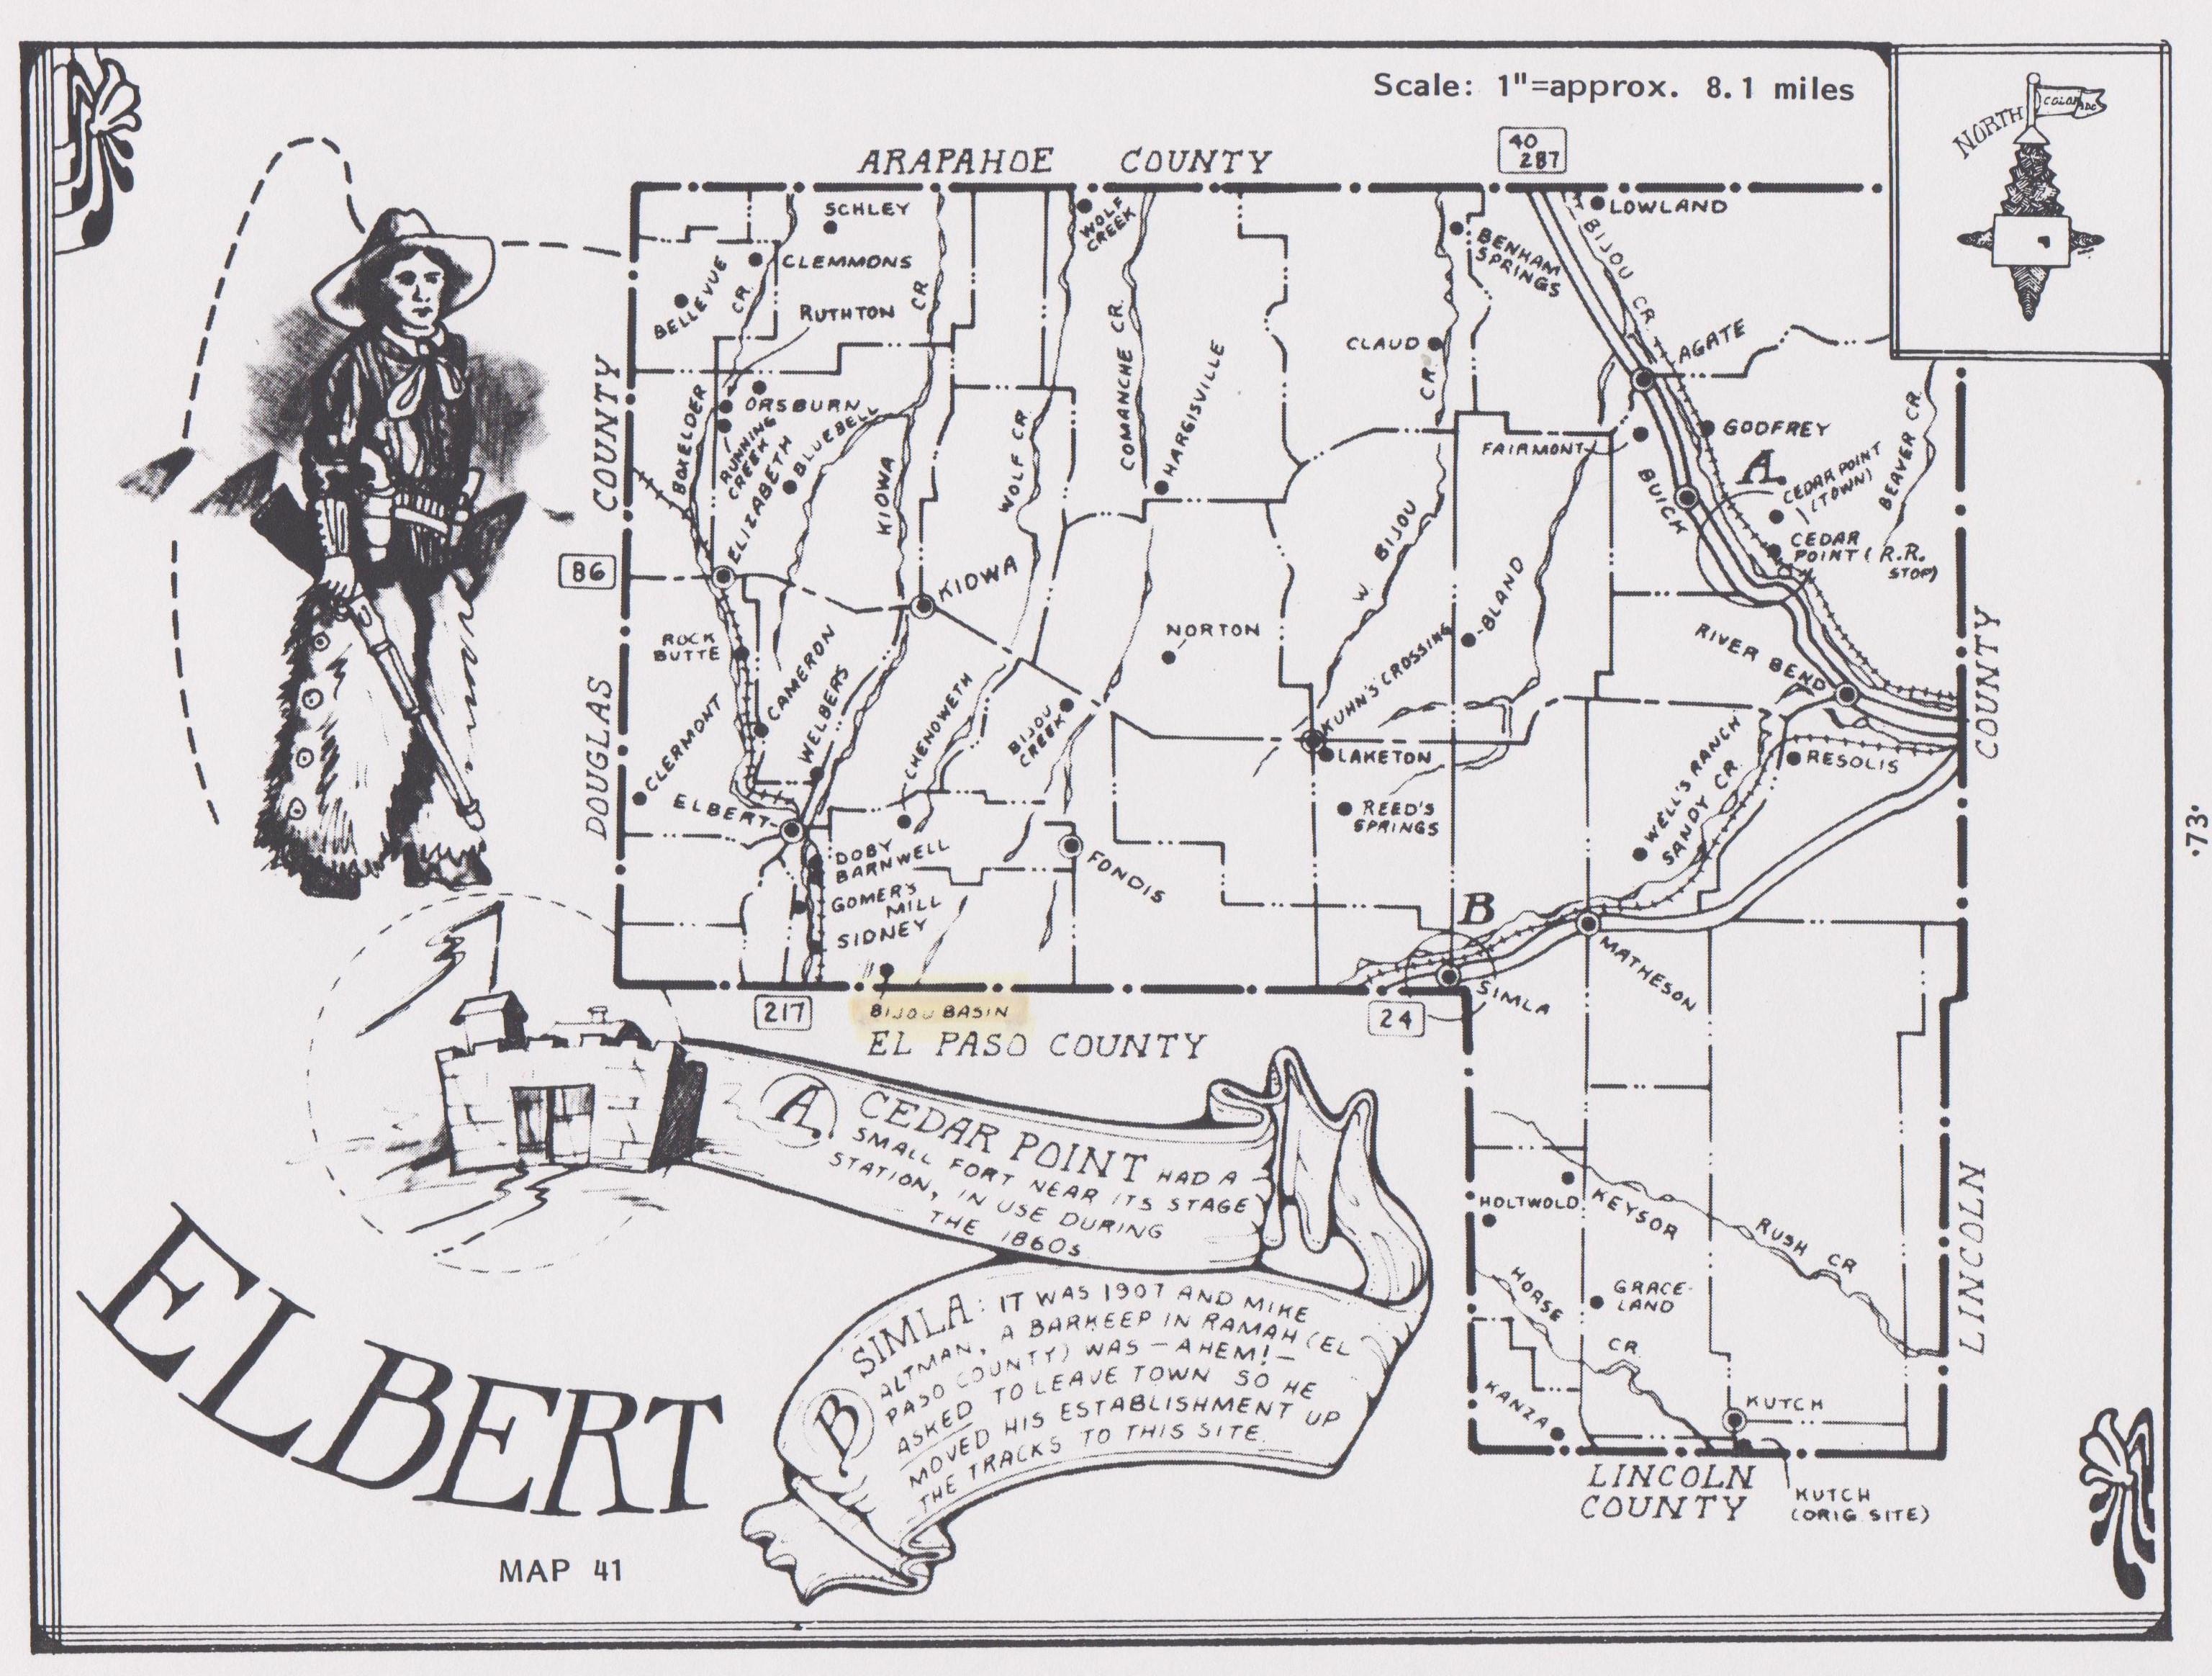 Newton, John Dallas, Elbert County, CO 1887 map